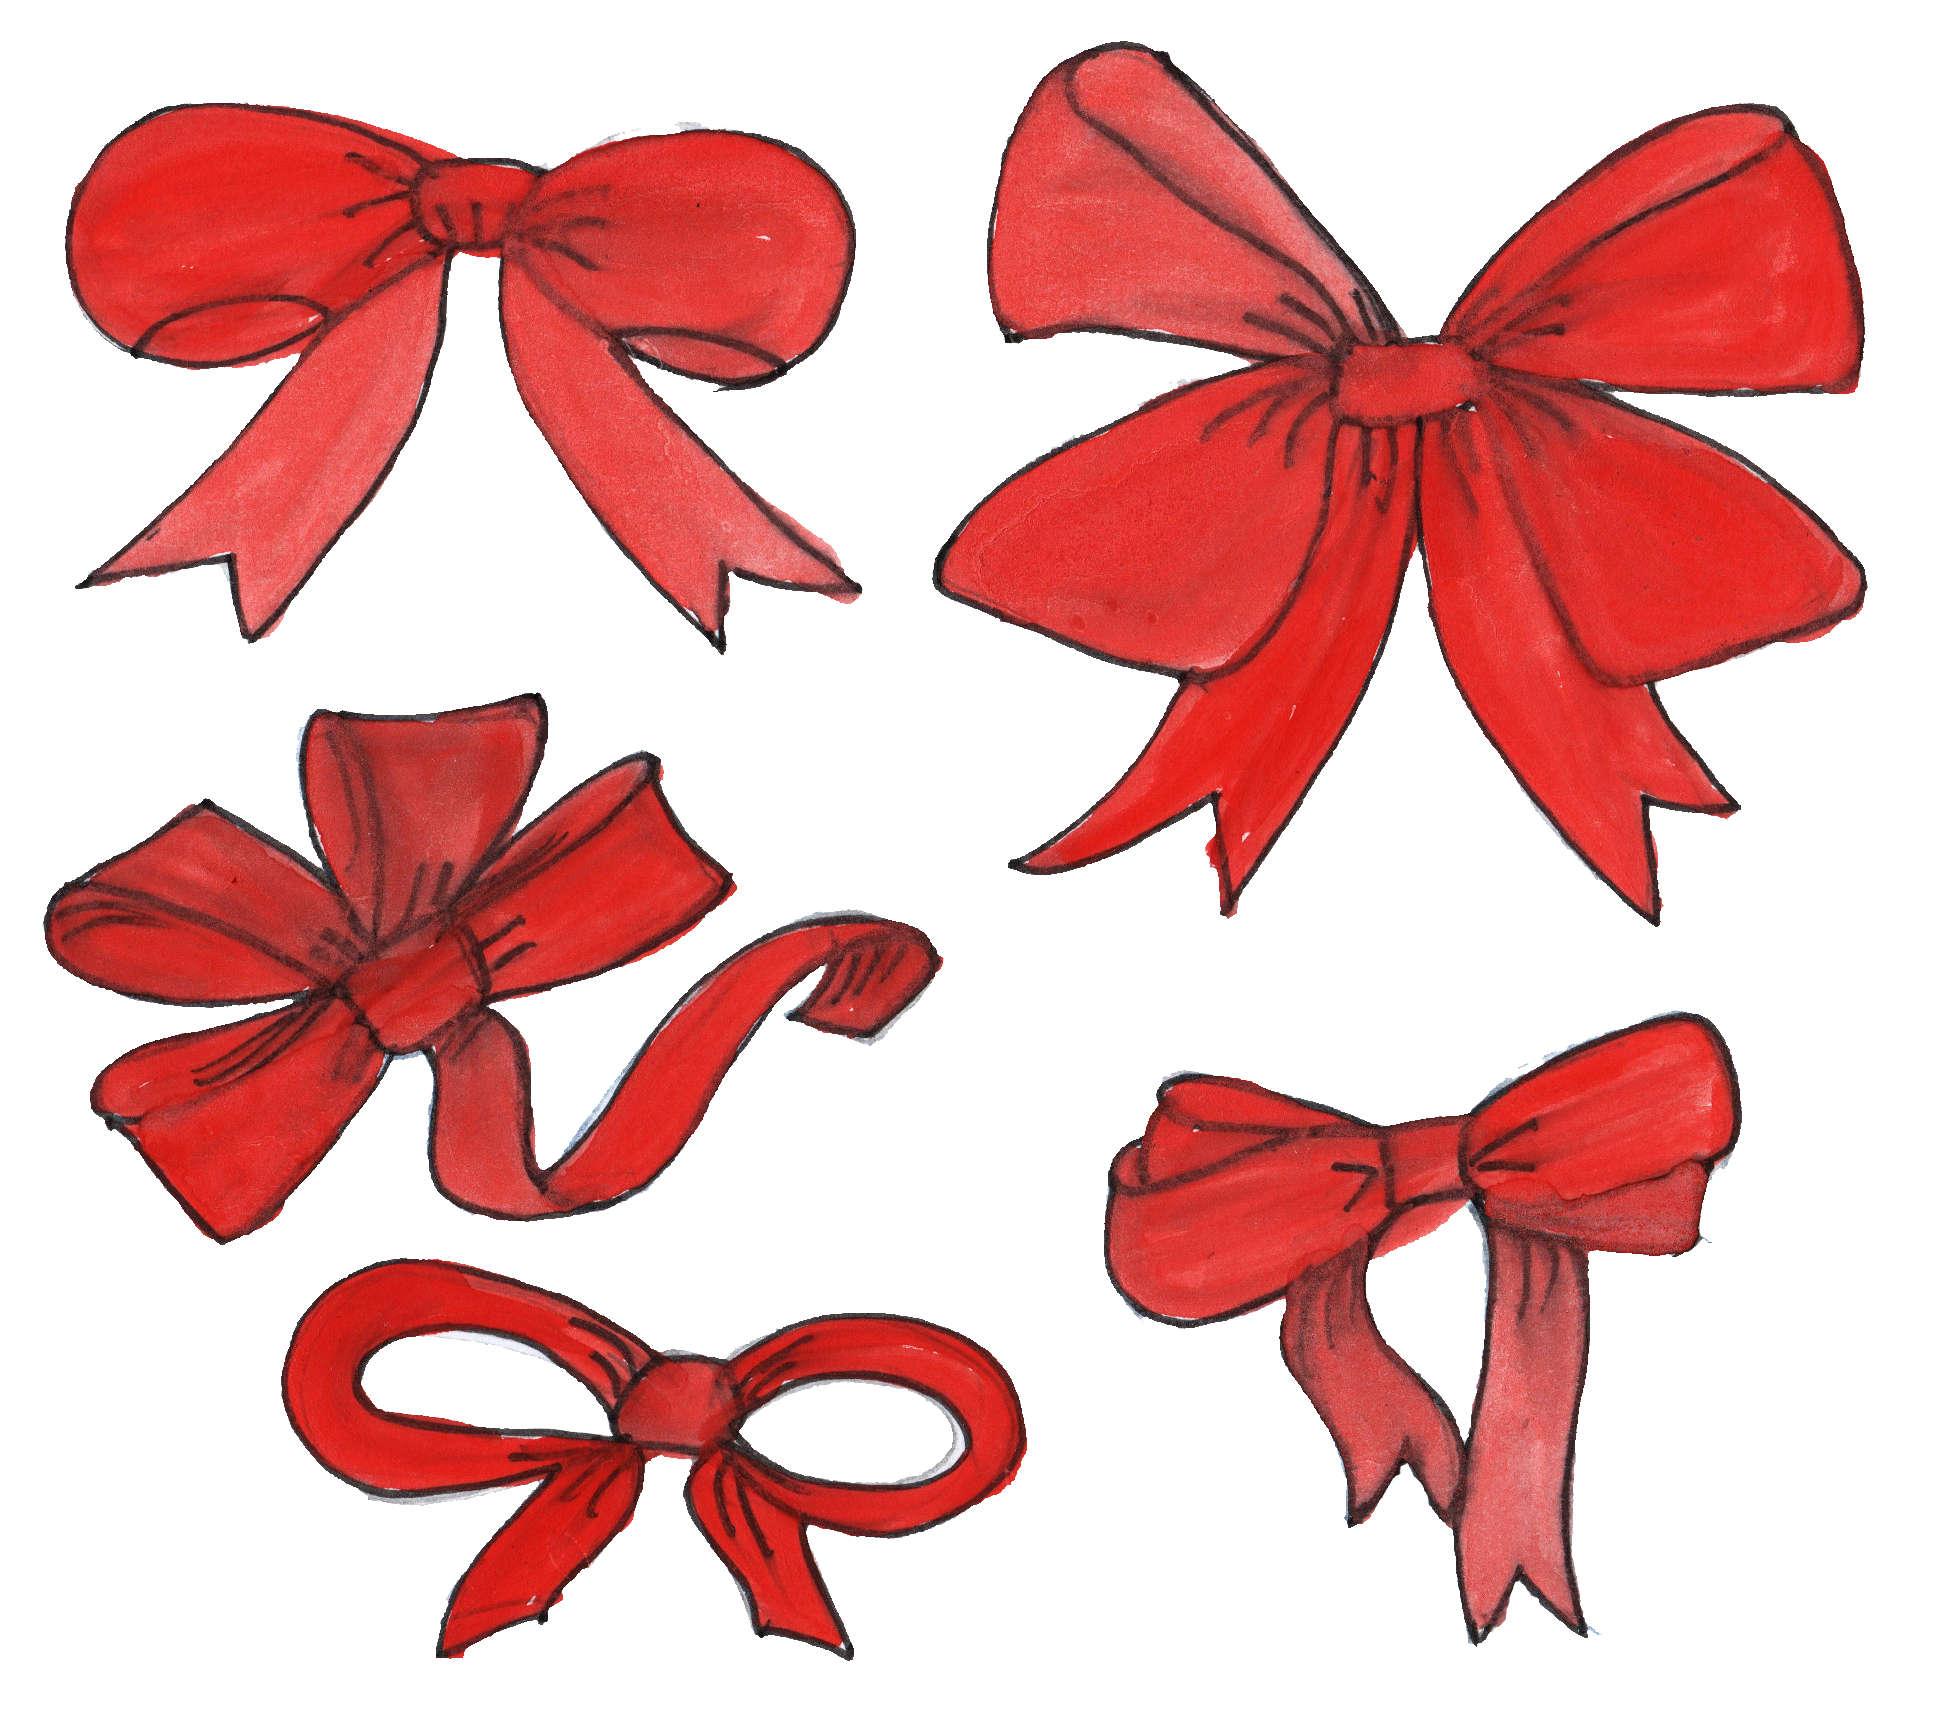 1957x1734 5 Red Ribbon Drawing (Png Transparent)